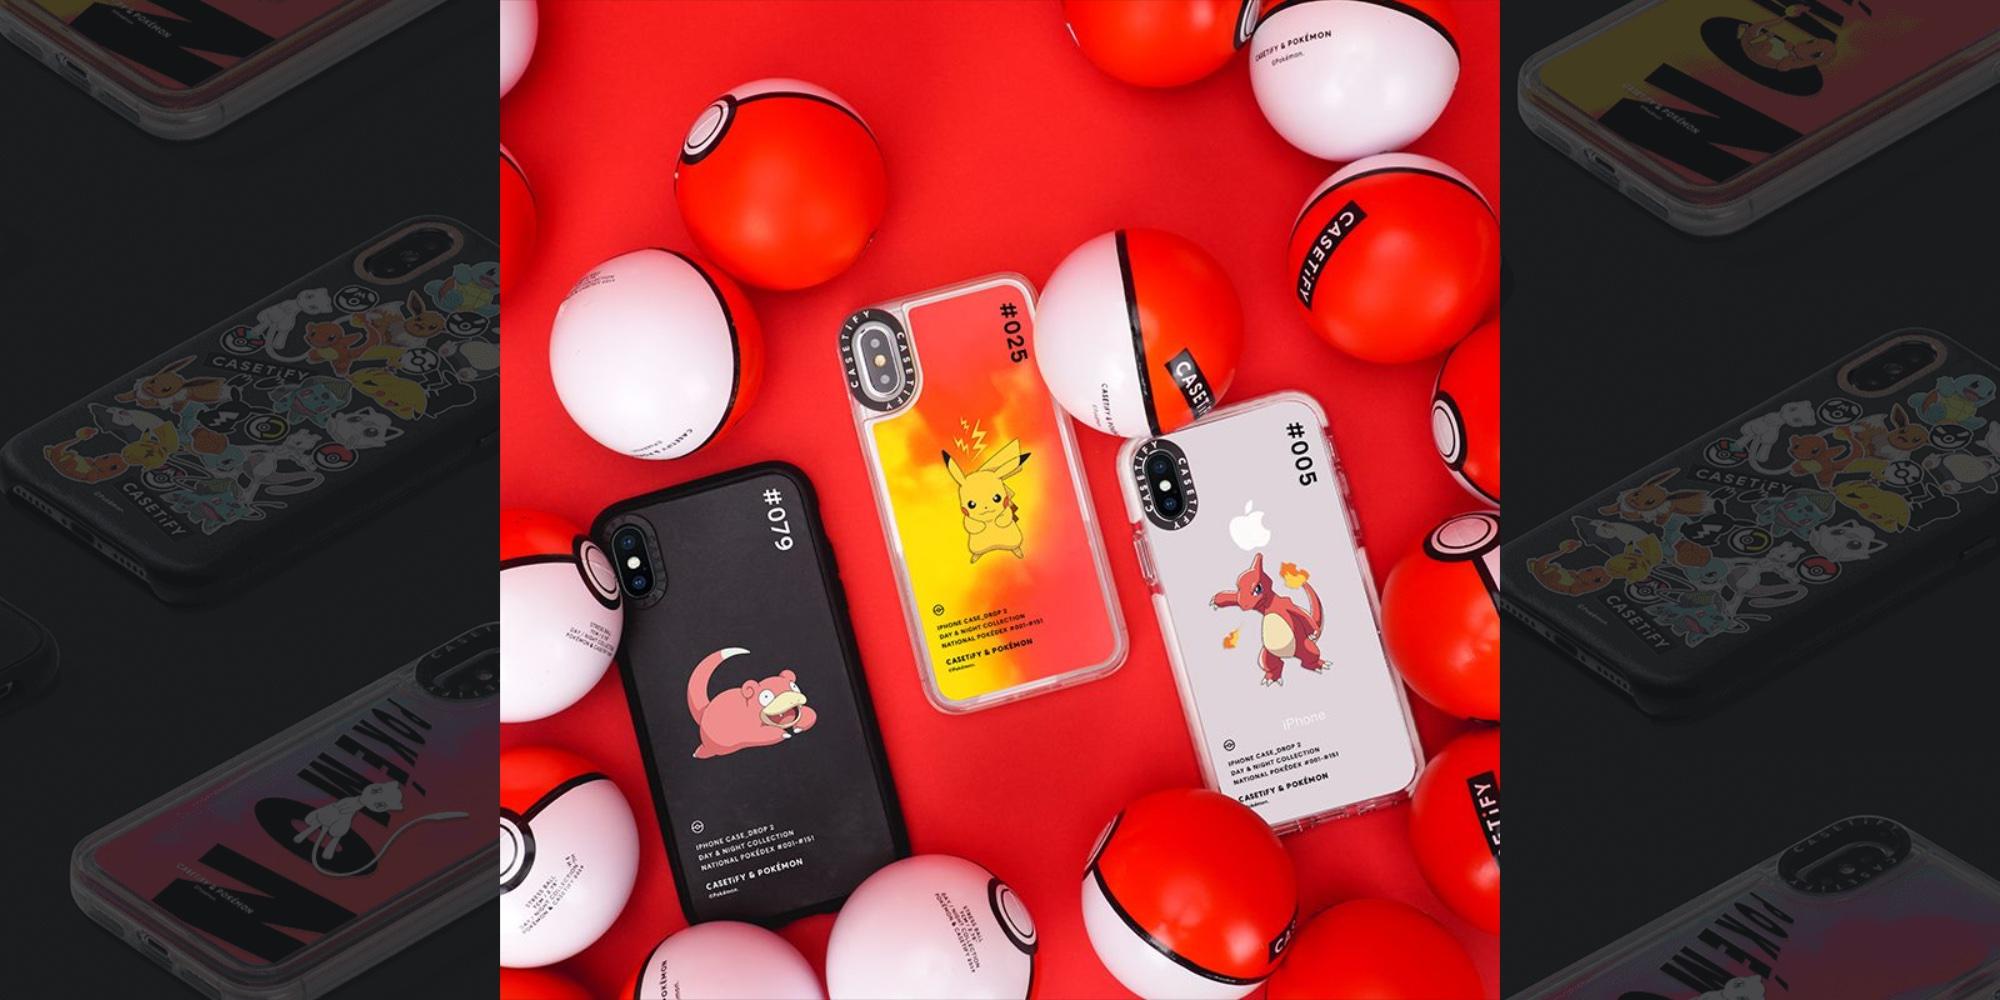 CASETiFY Pokémon iPhone Cases